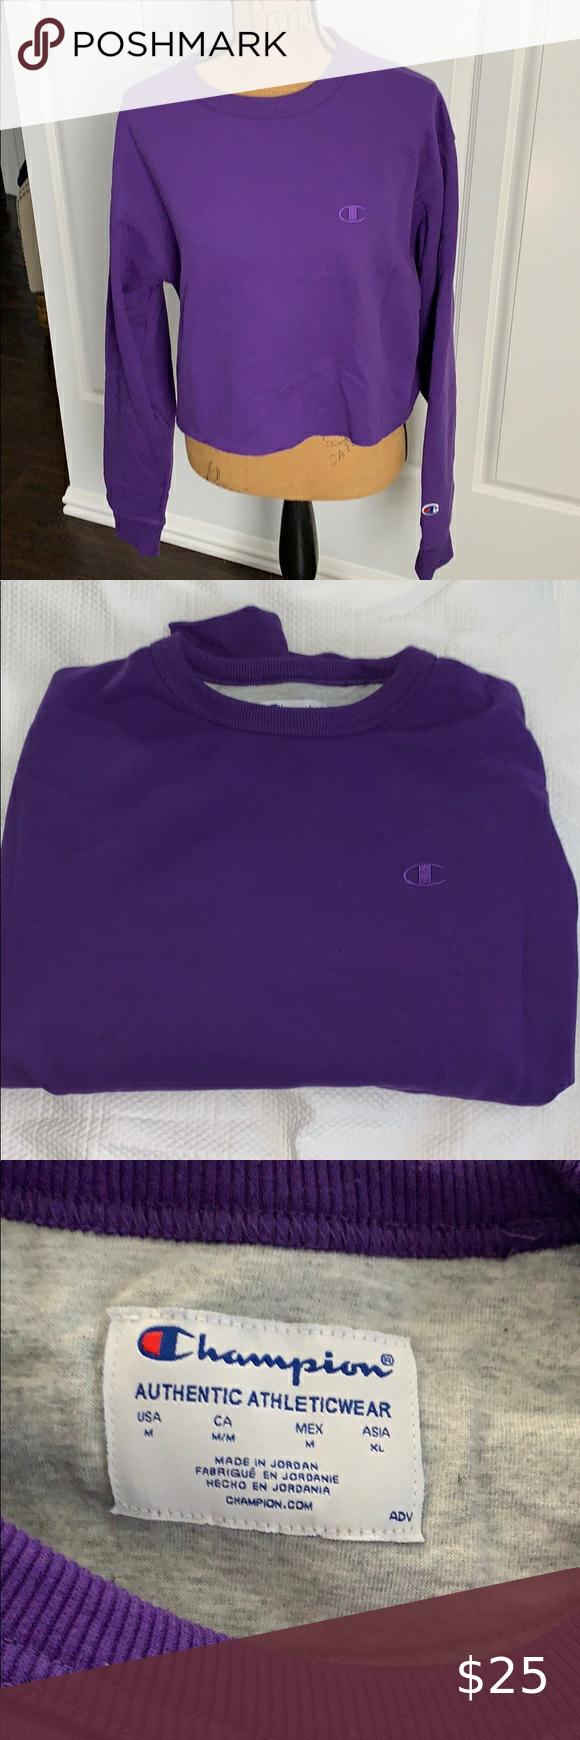 Champion Crop Sweatshirt Athletic Wear Sweatshirts Crop Sweatshirt Champion Cropped Sweatshirt [ 1740 x 580 Pixel ]